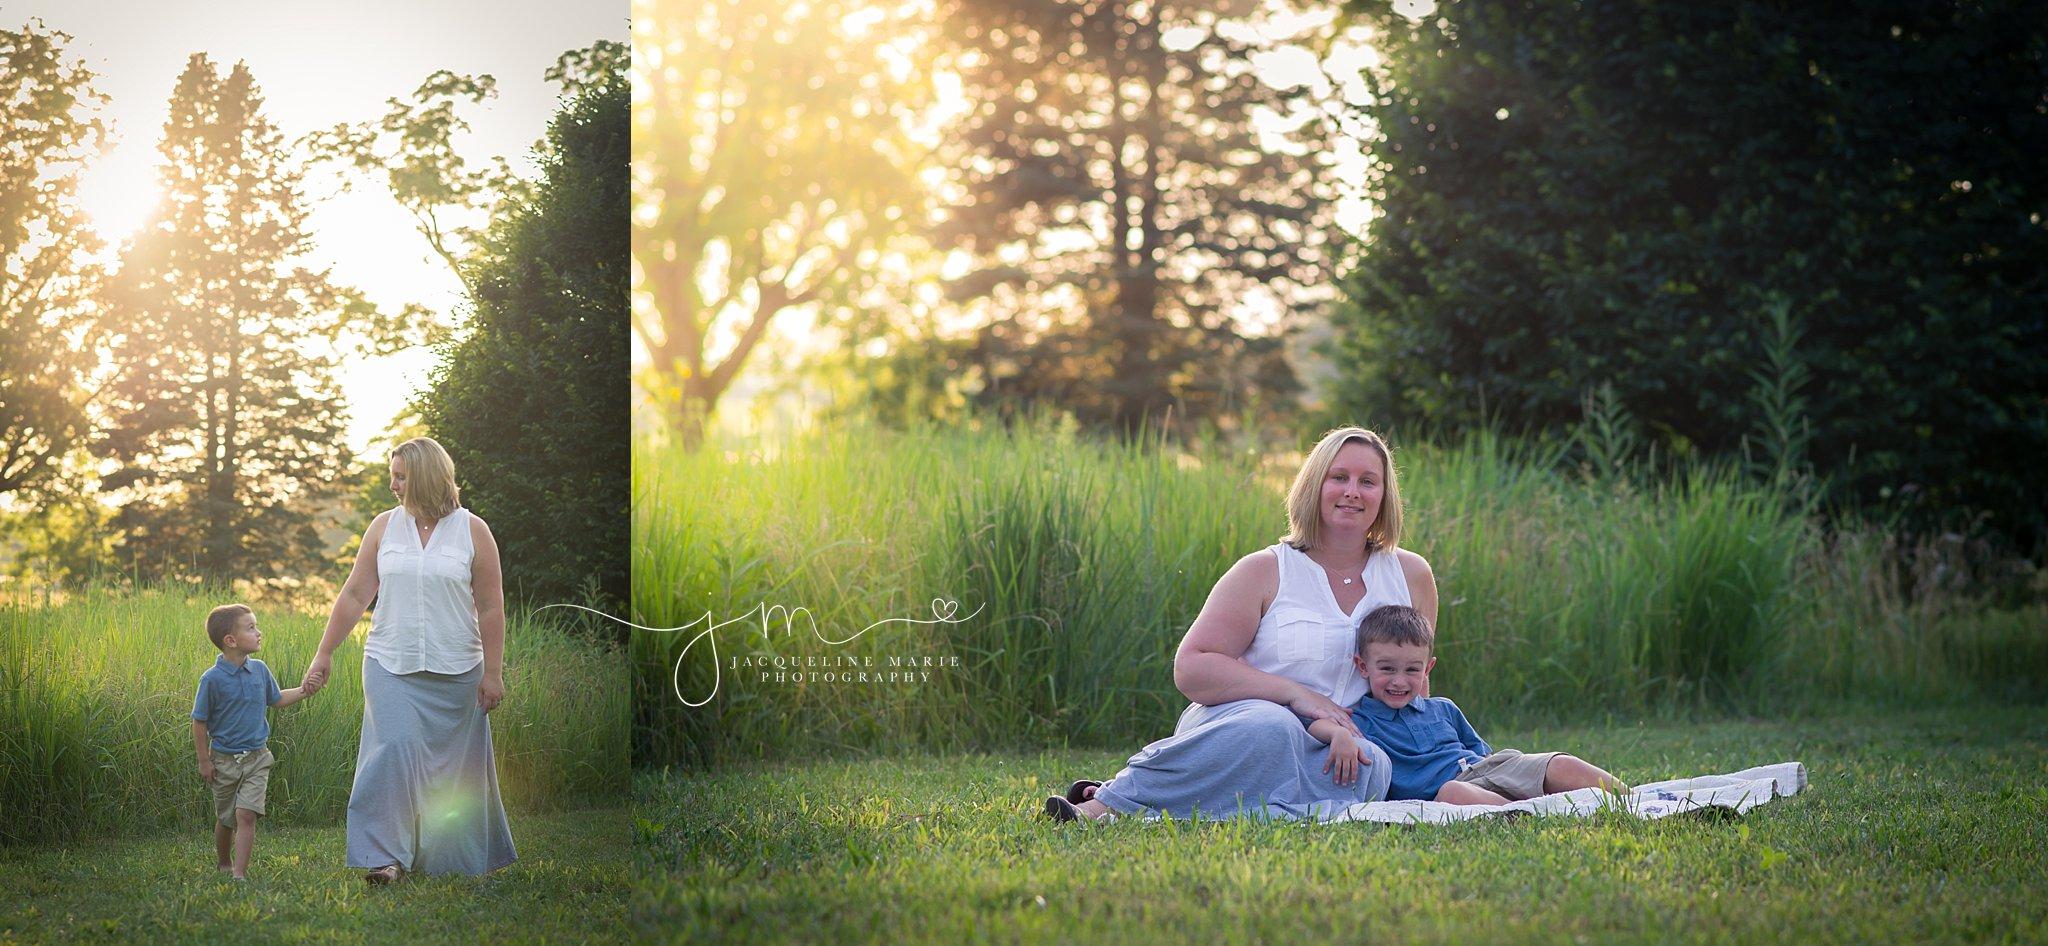 Columbus Ohio photographer, family photography Columbus, mother and son photography, sunset session, mother and son pose, Jacqueline Marie Photography LLC